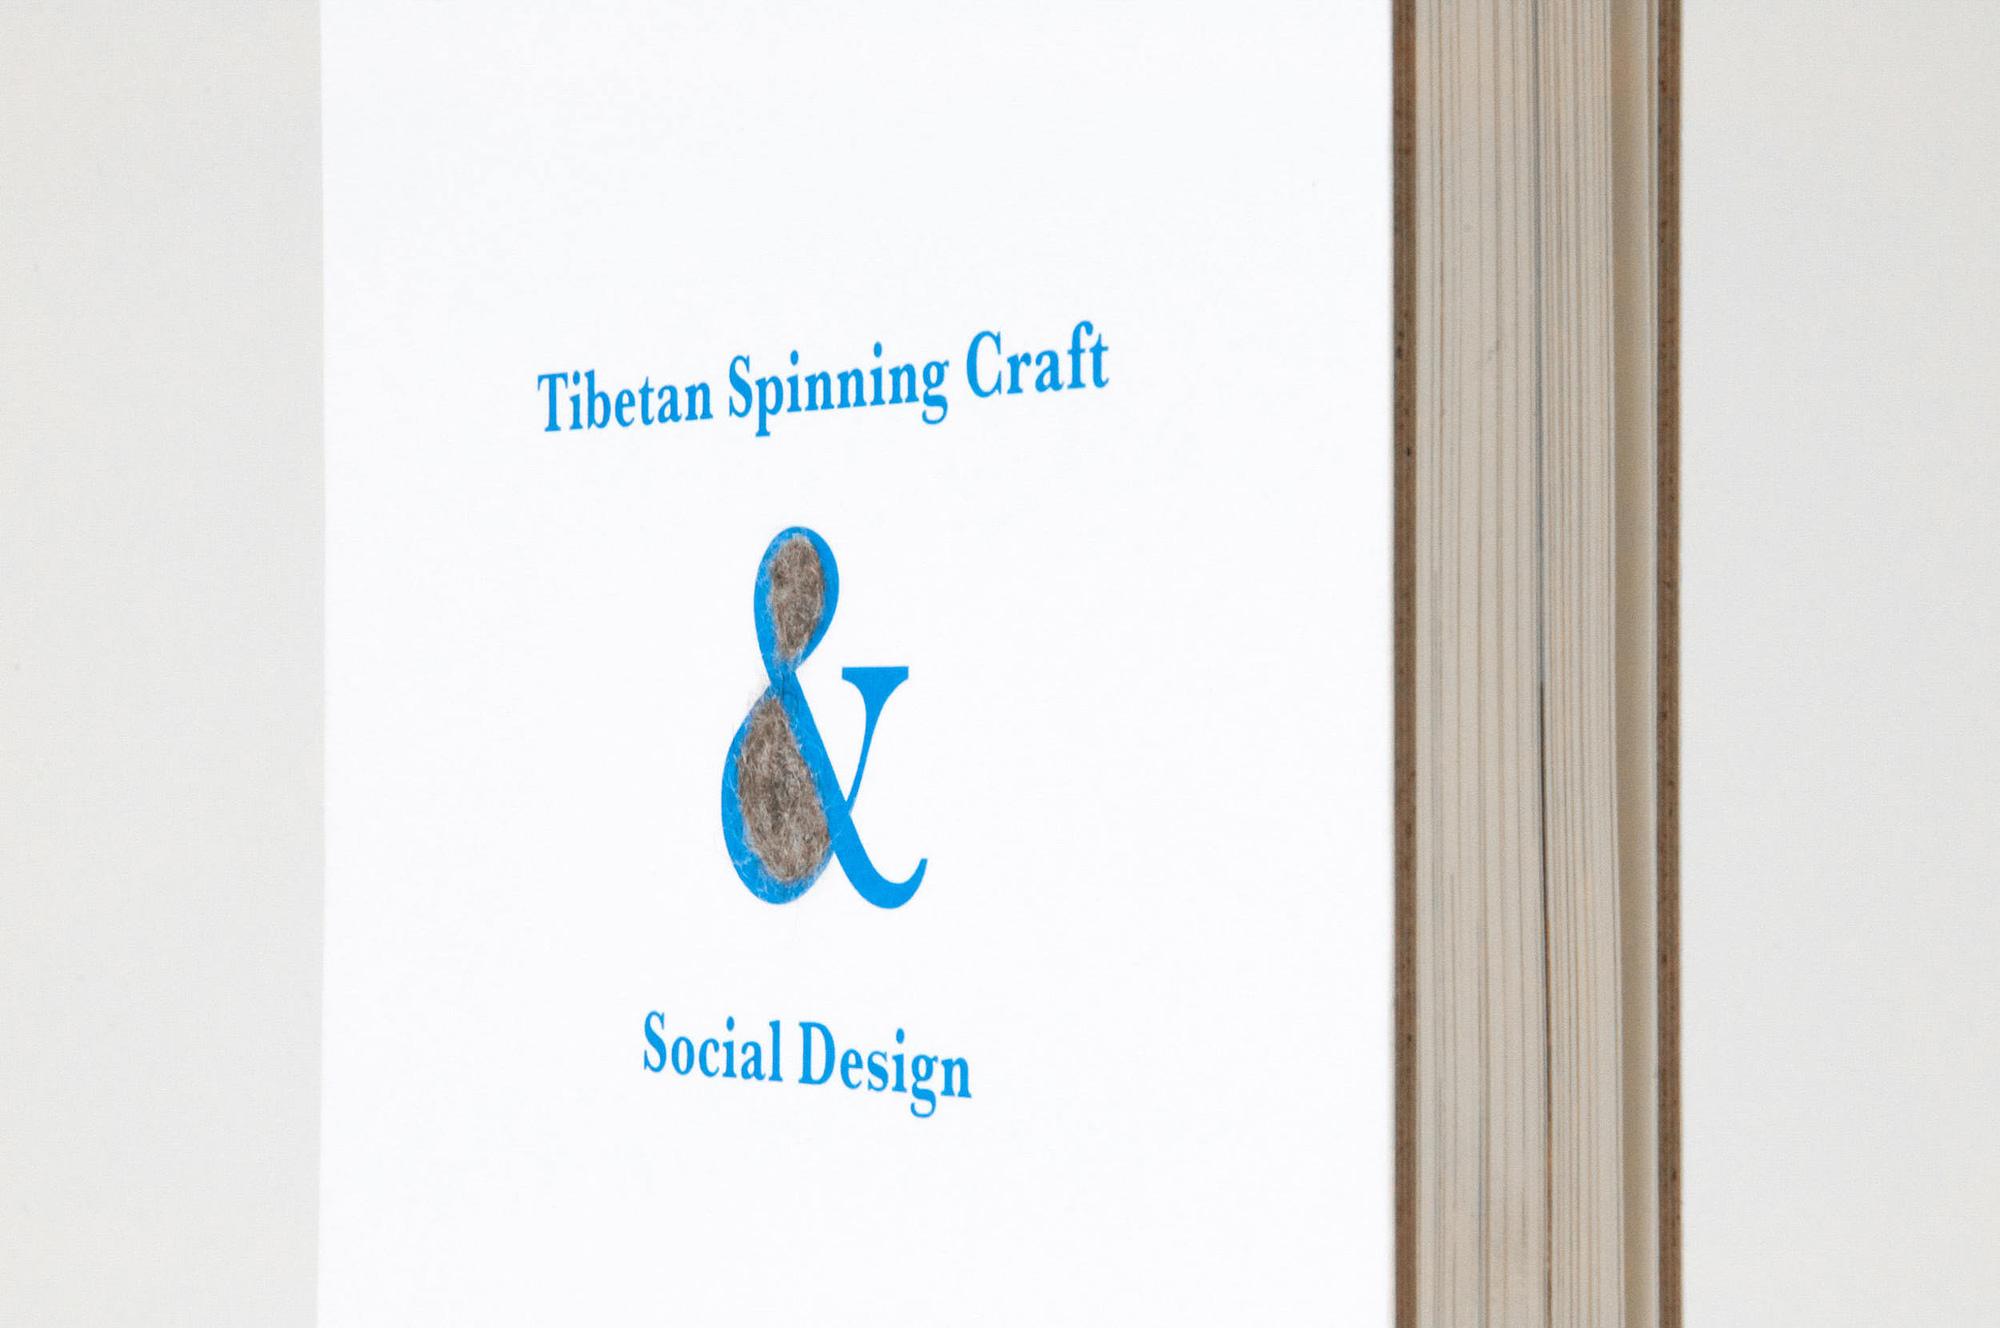 Tibetan Spinning Craft and Social Design 4